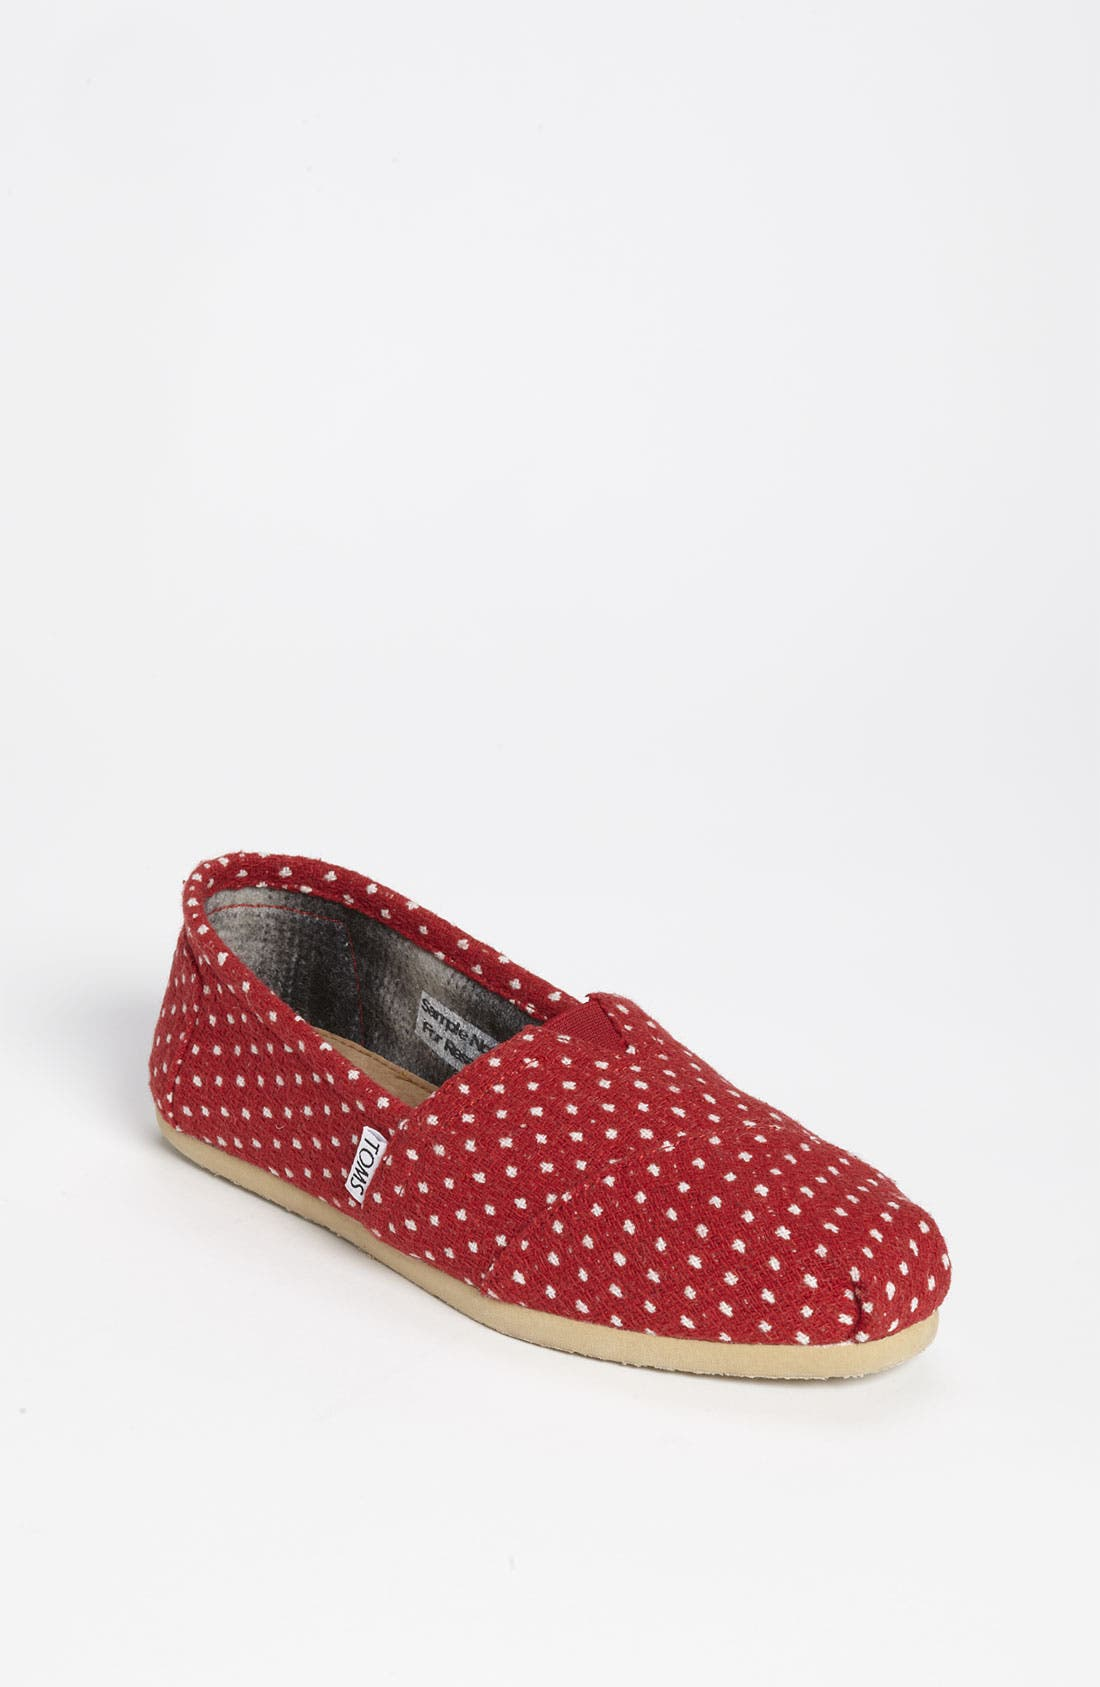 Alternate Image 1 Selected - TOMS 'Classic - Dot' Woolen Slip-On (Women)